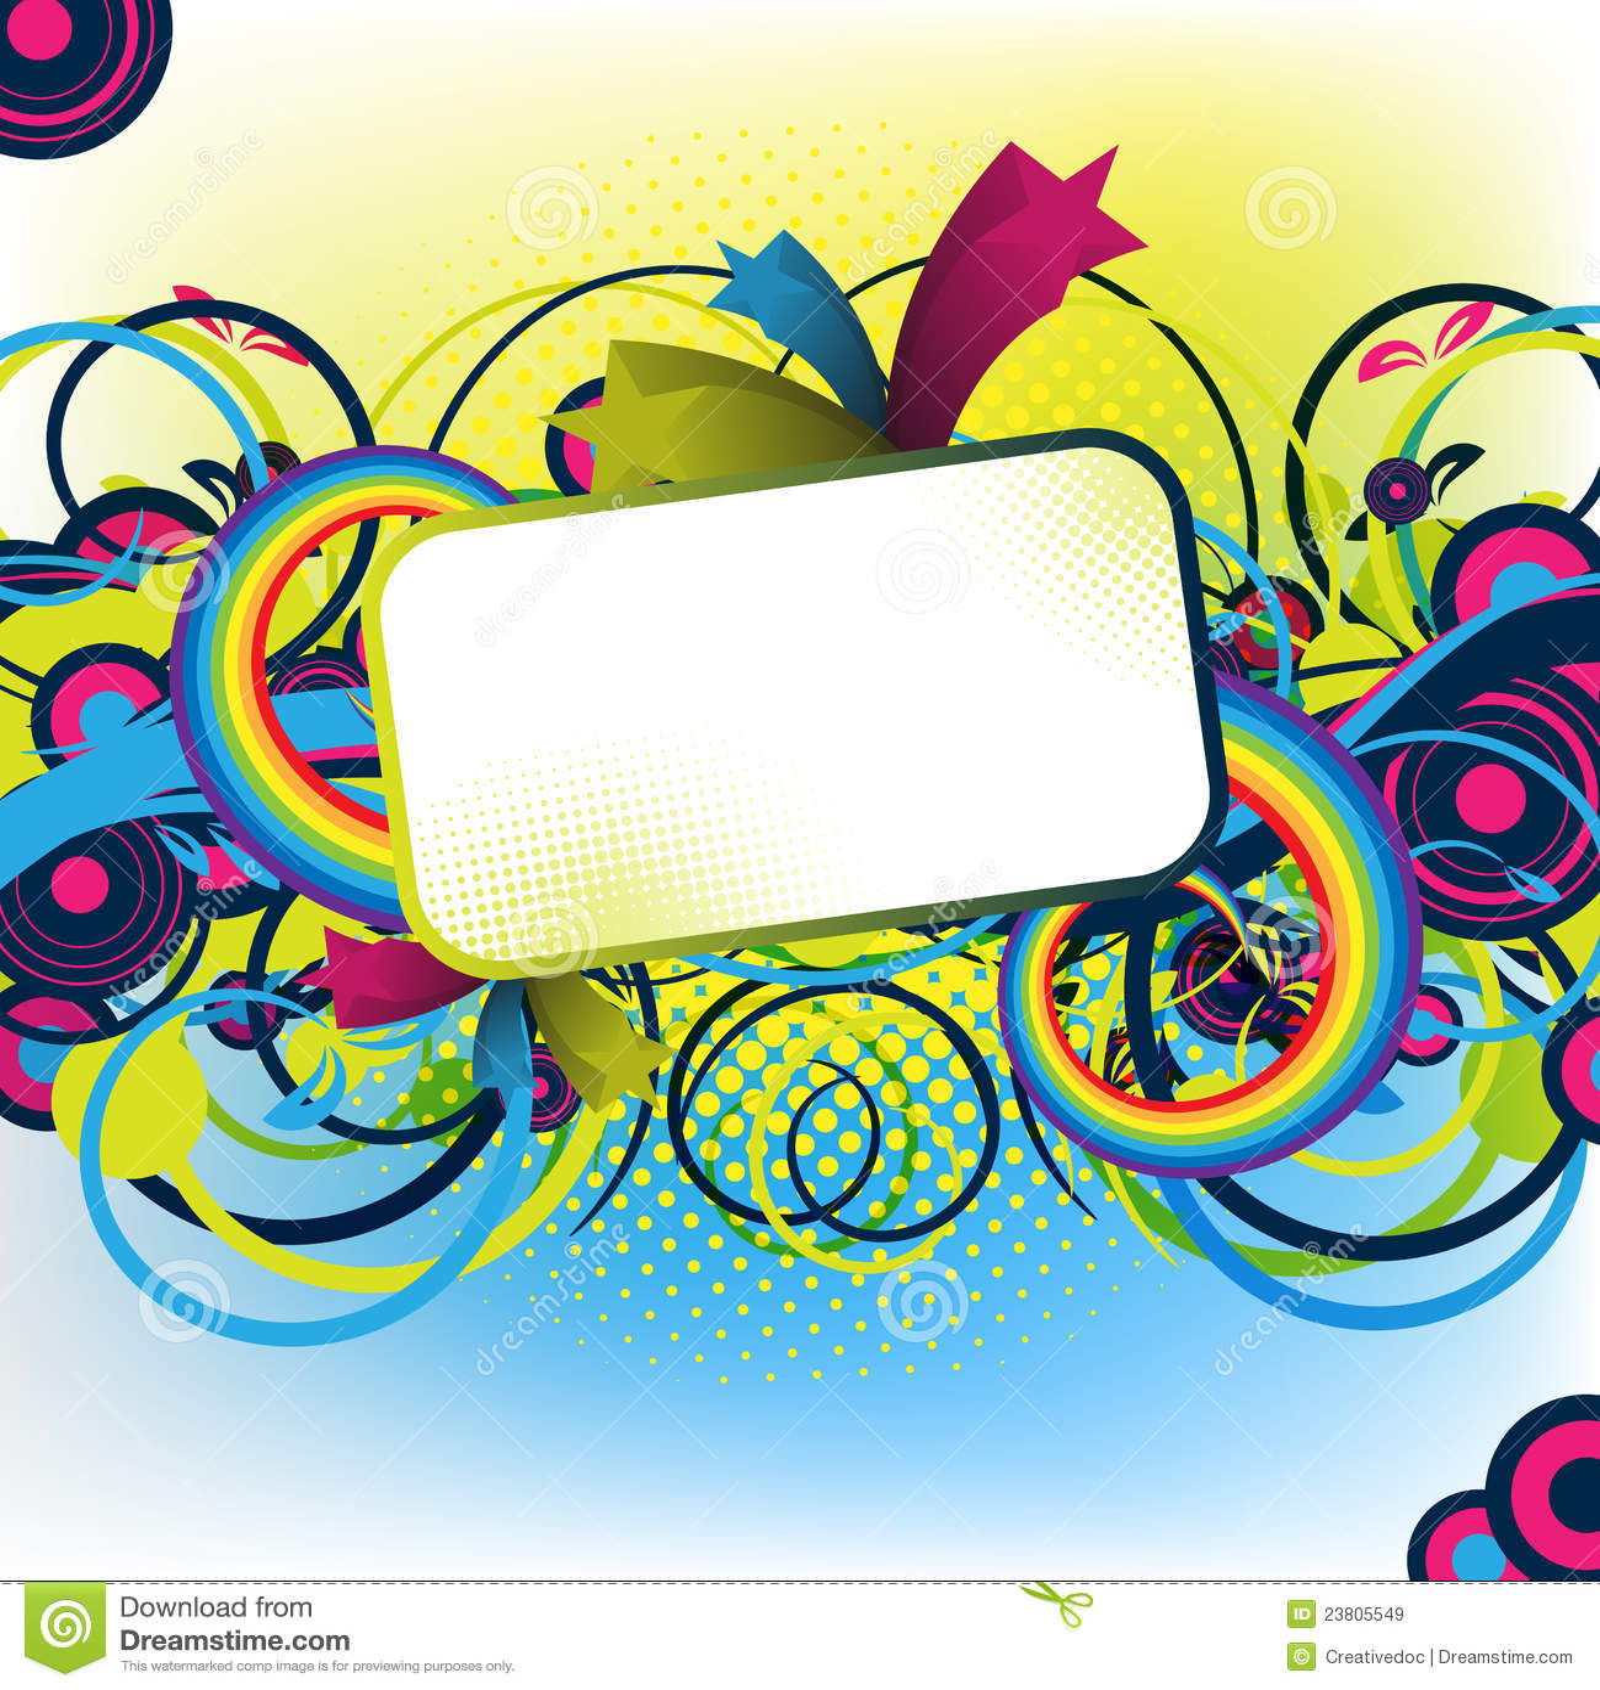 Colorful artwork for design